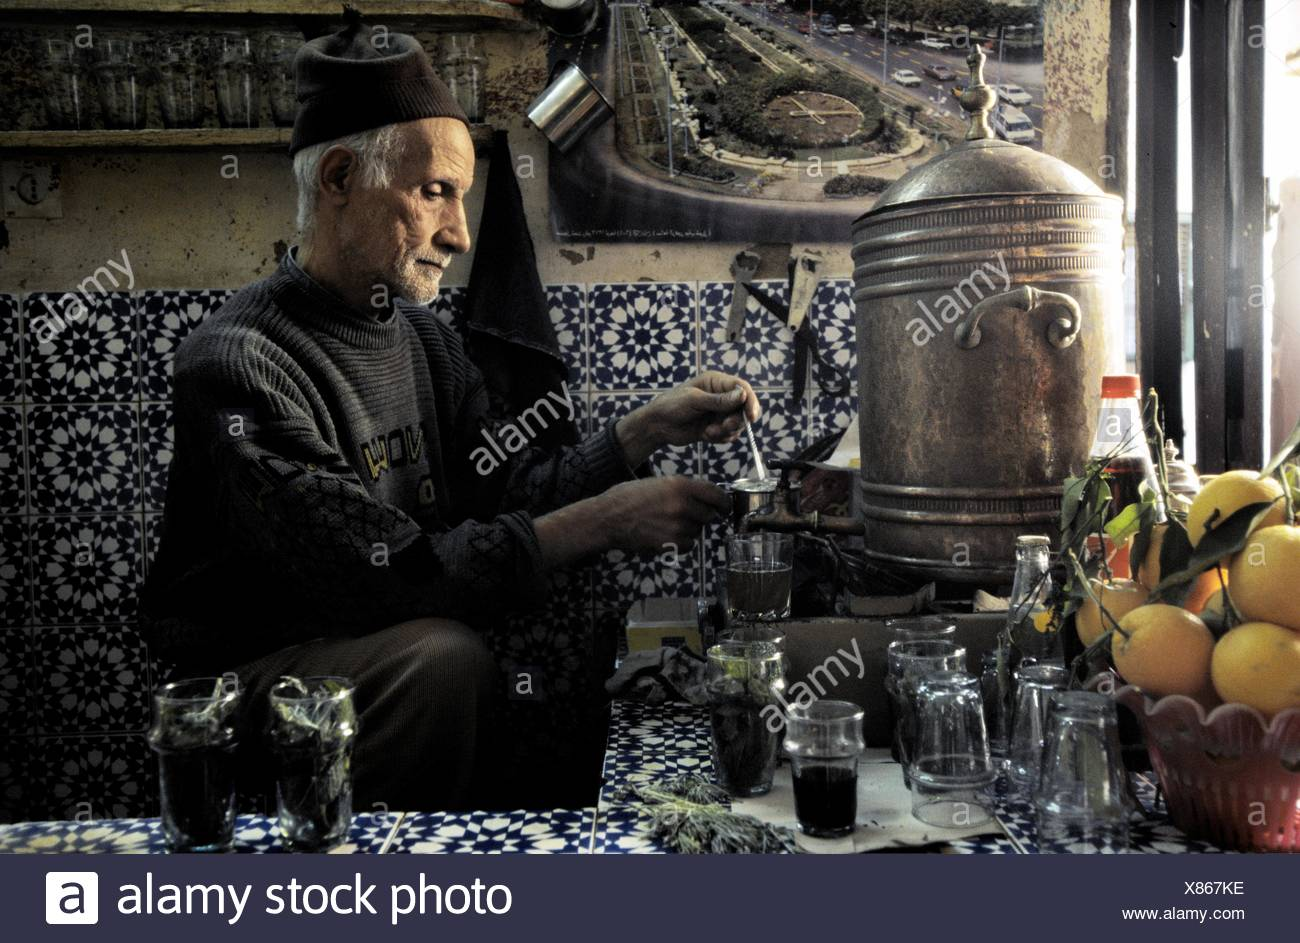 Teteria tradicional  Fes el Bali  Fez Ciudad Imperial Marruecos Africa Stock Photo